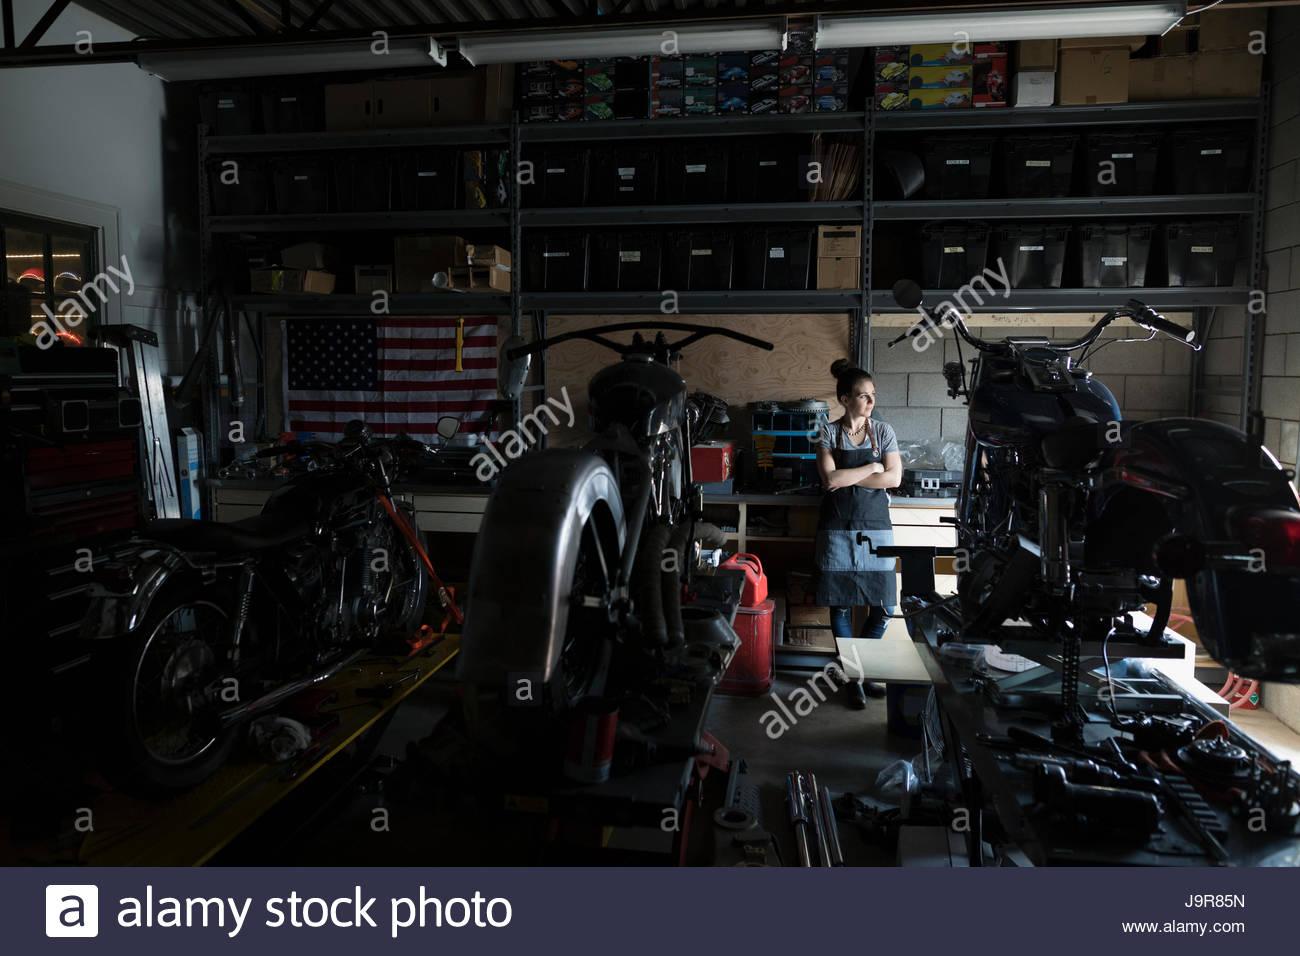 Pensive female motorcycle mechanic working behind motorcycles in auto repair shop - Stock Image